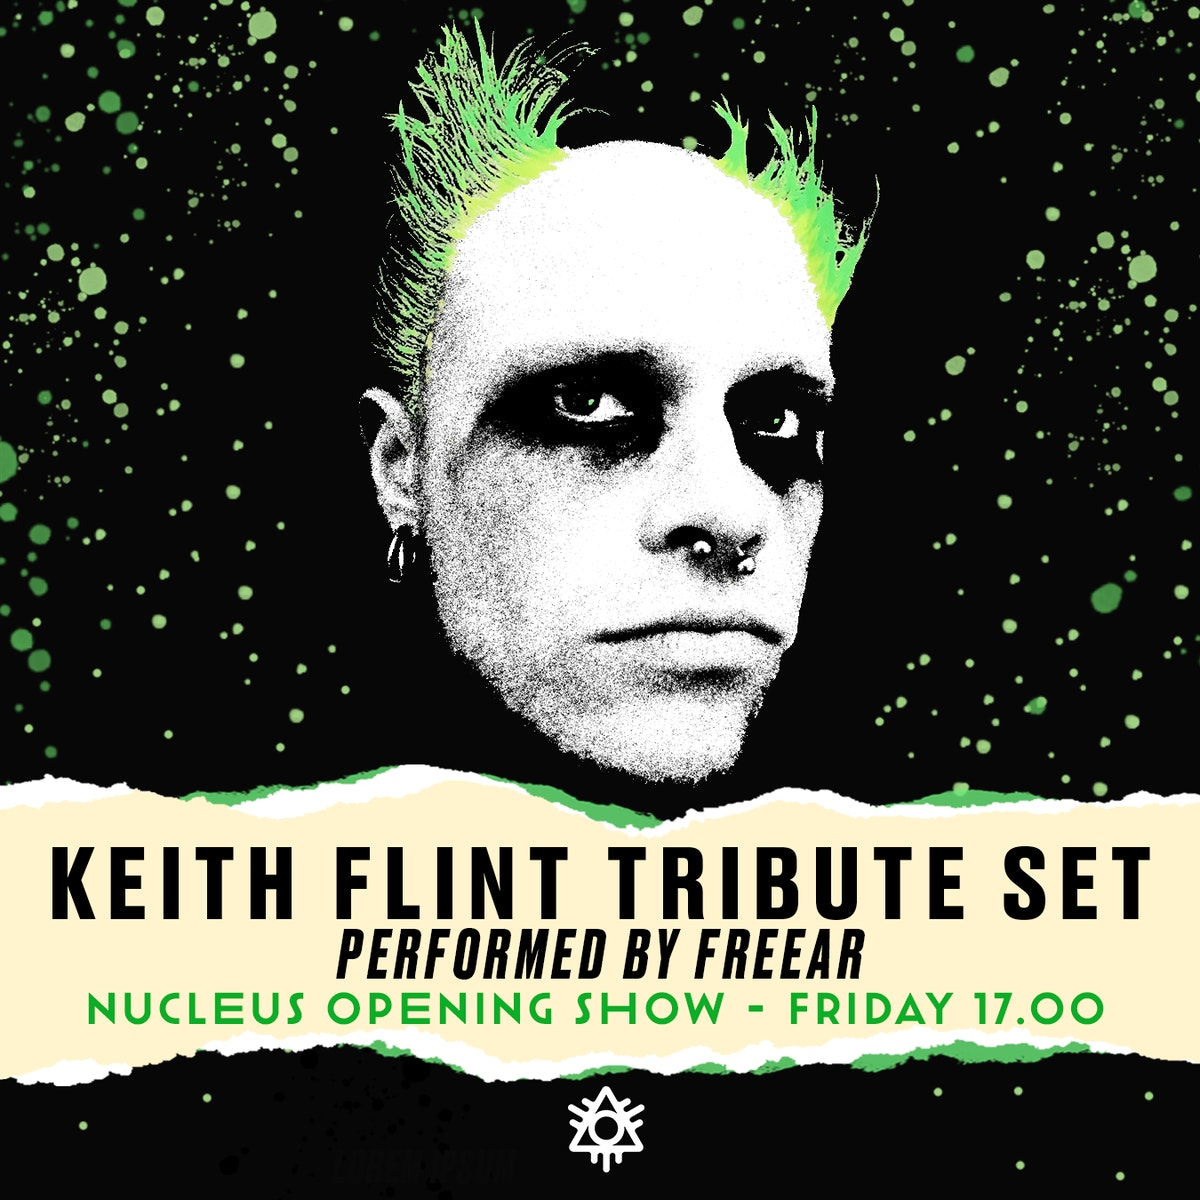 Keith Flint Tribute Set